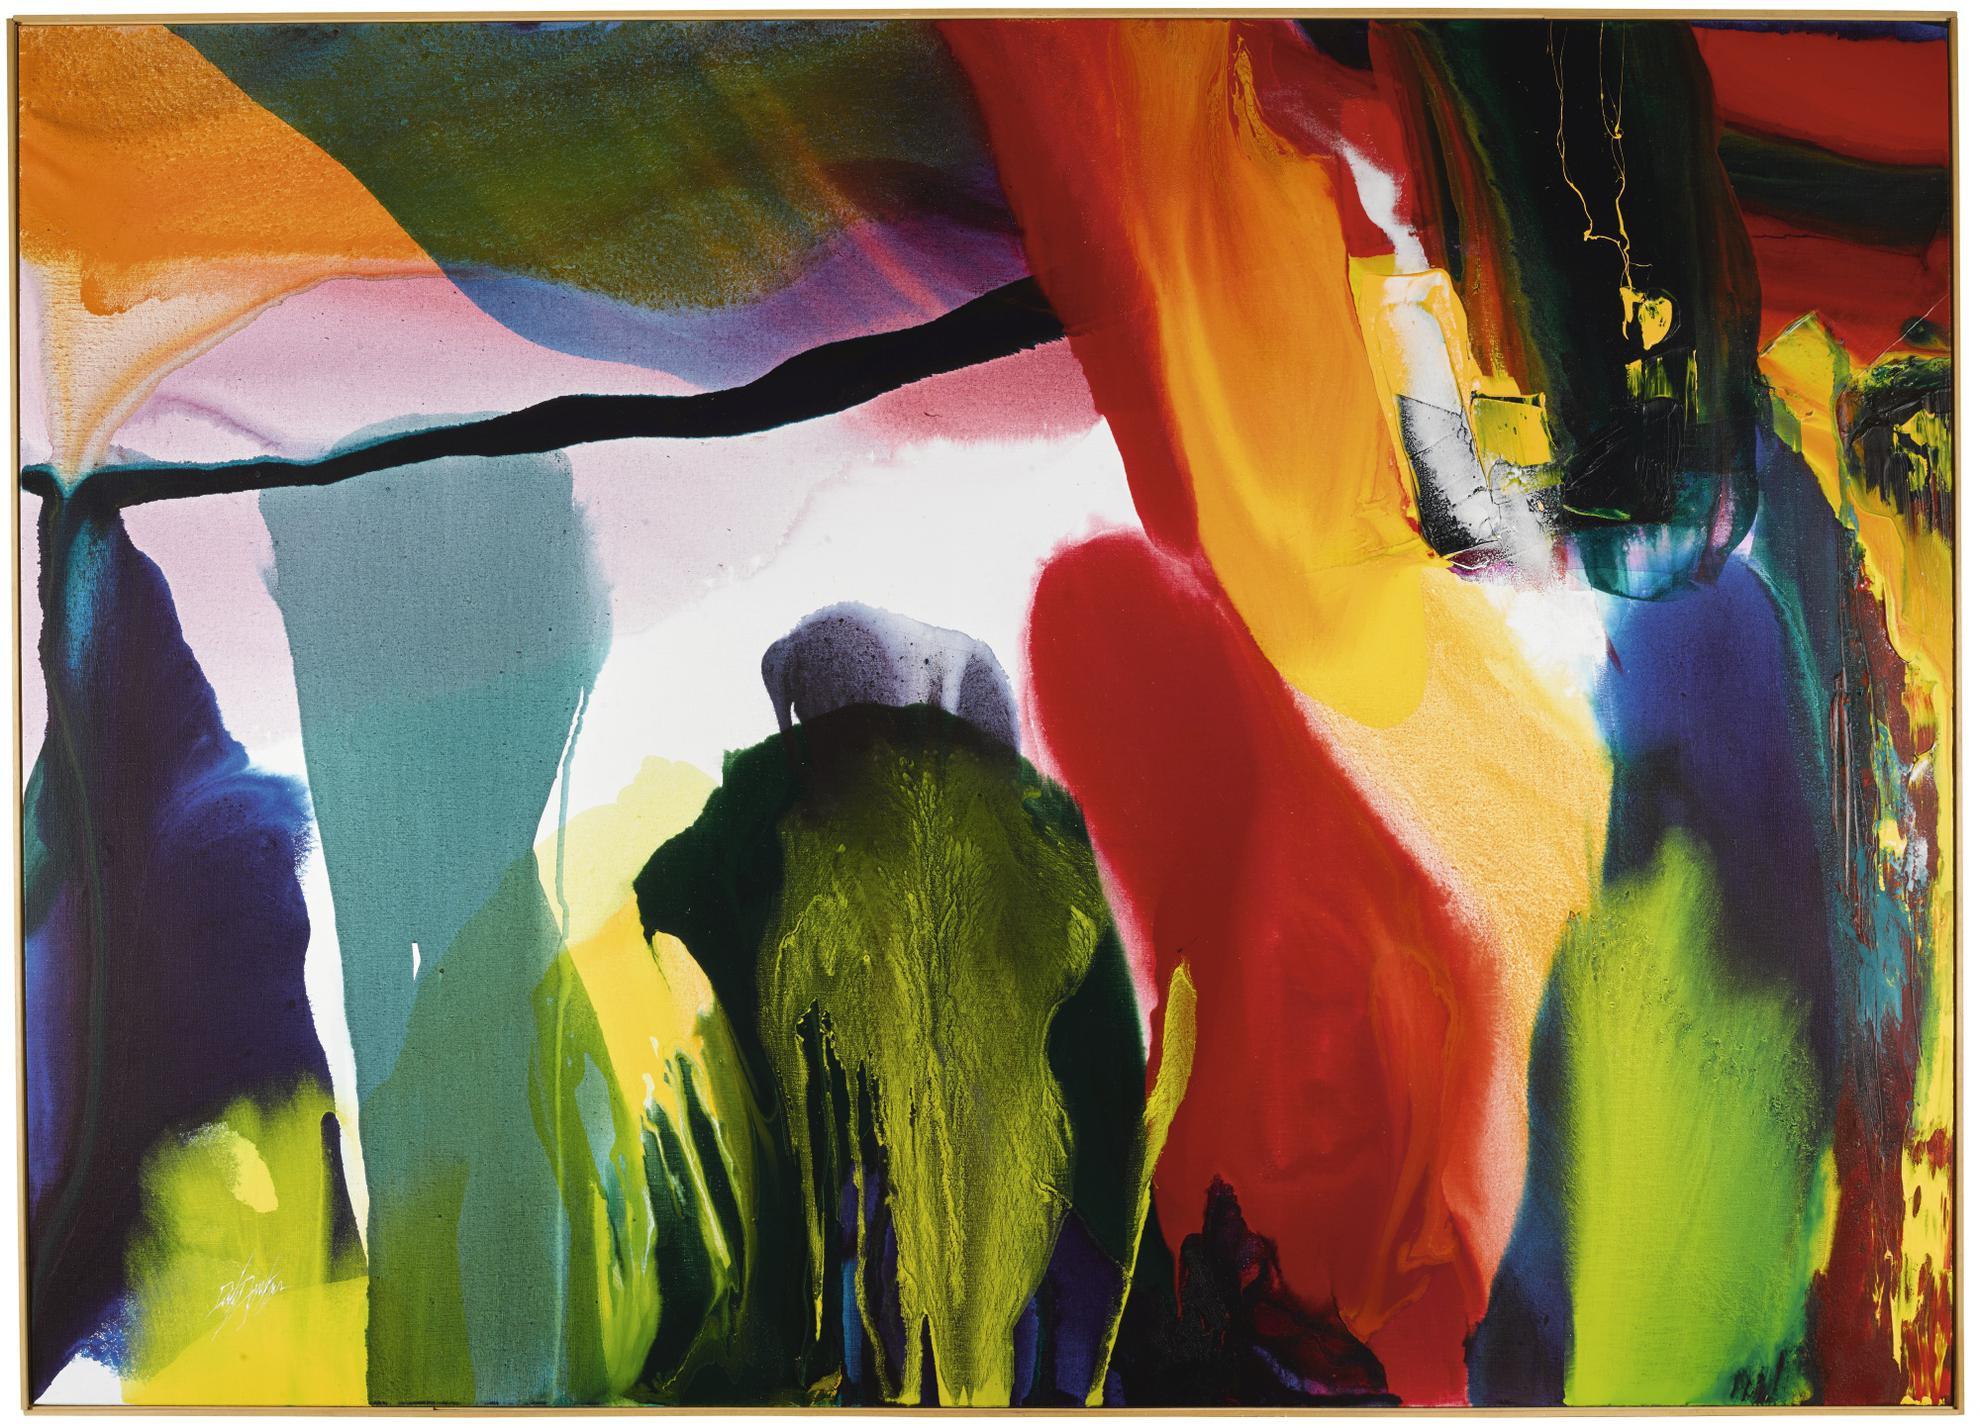 Paul Jenkins-Phenomena Solstice Encounter-2003